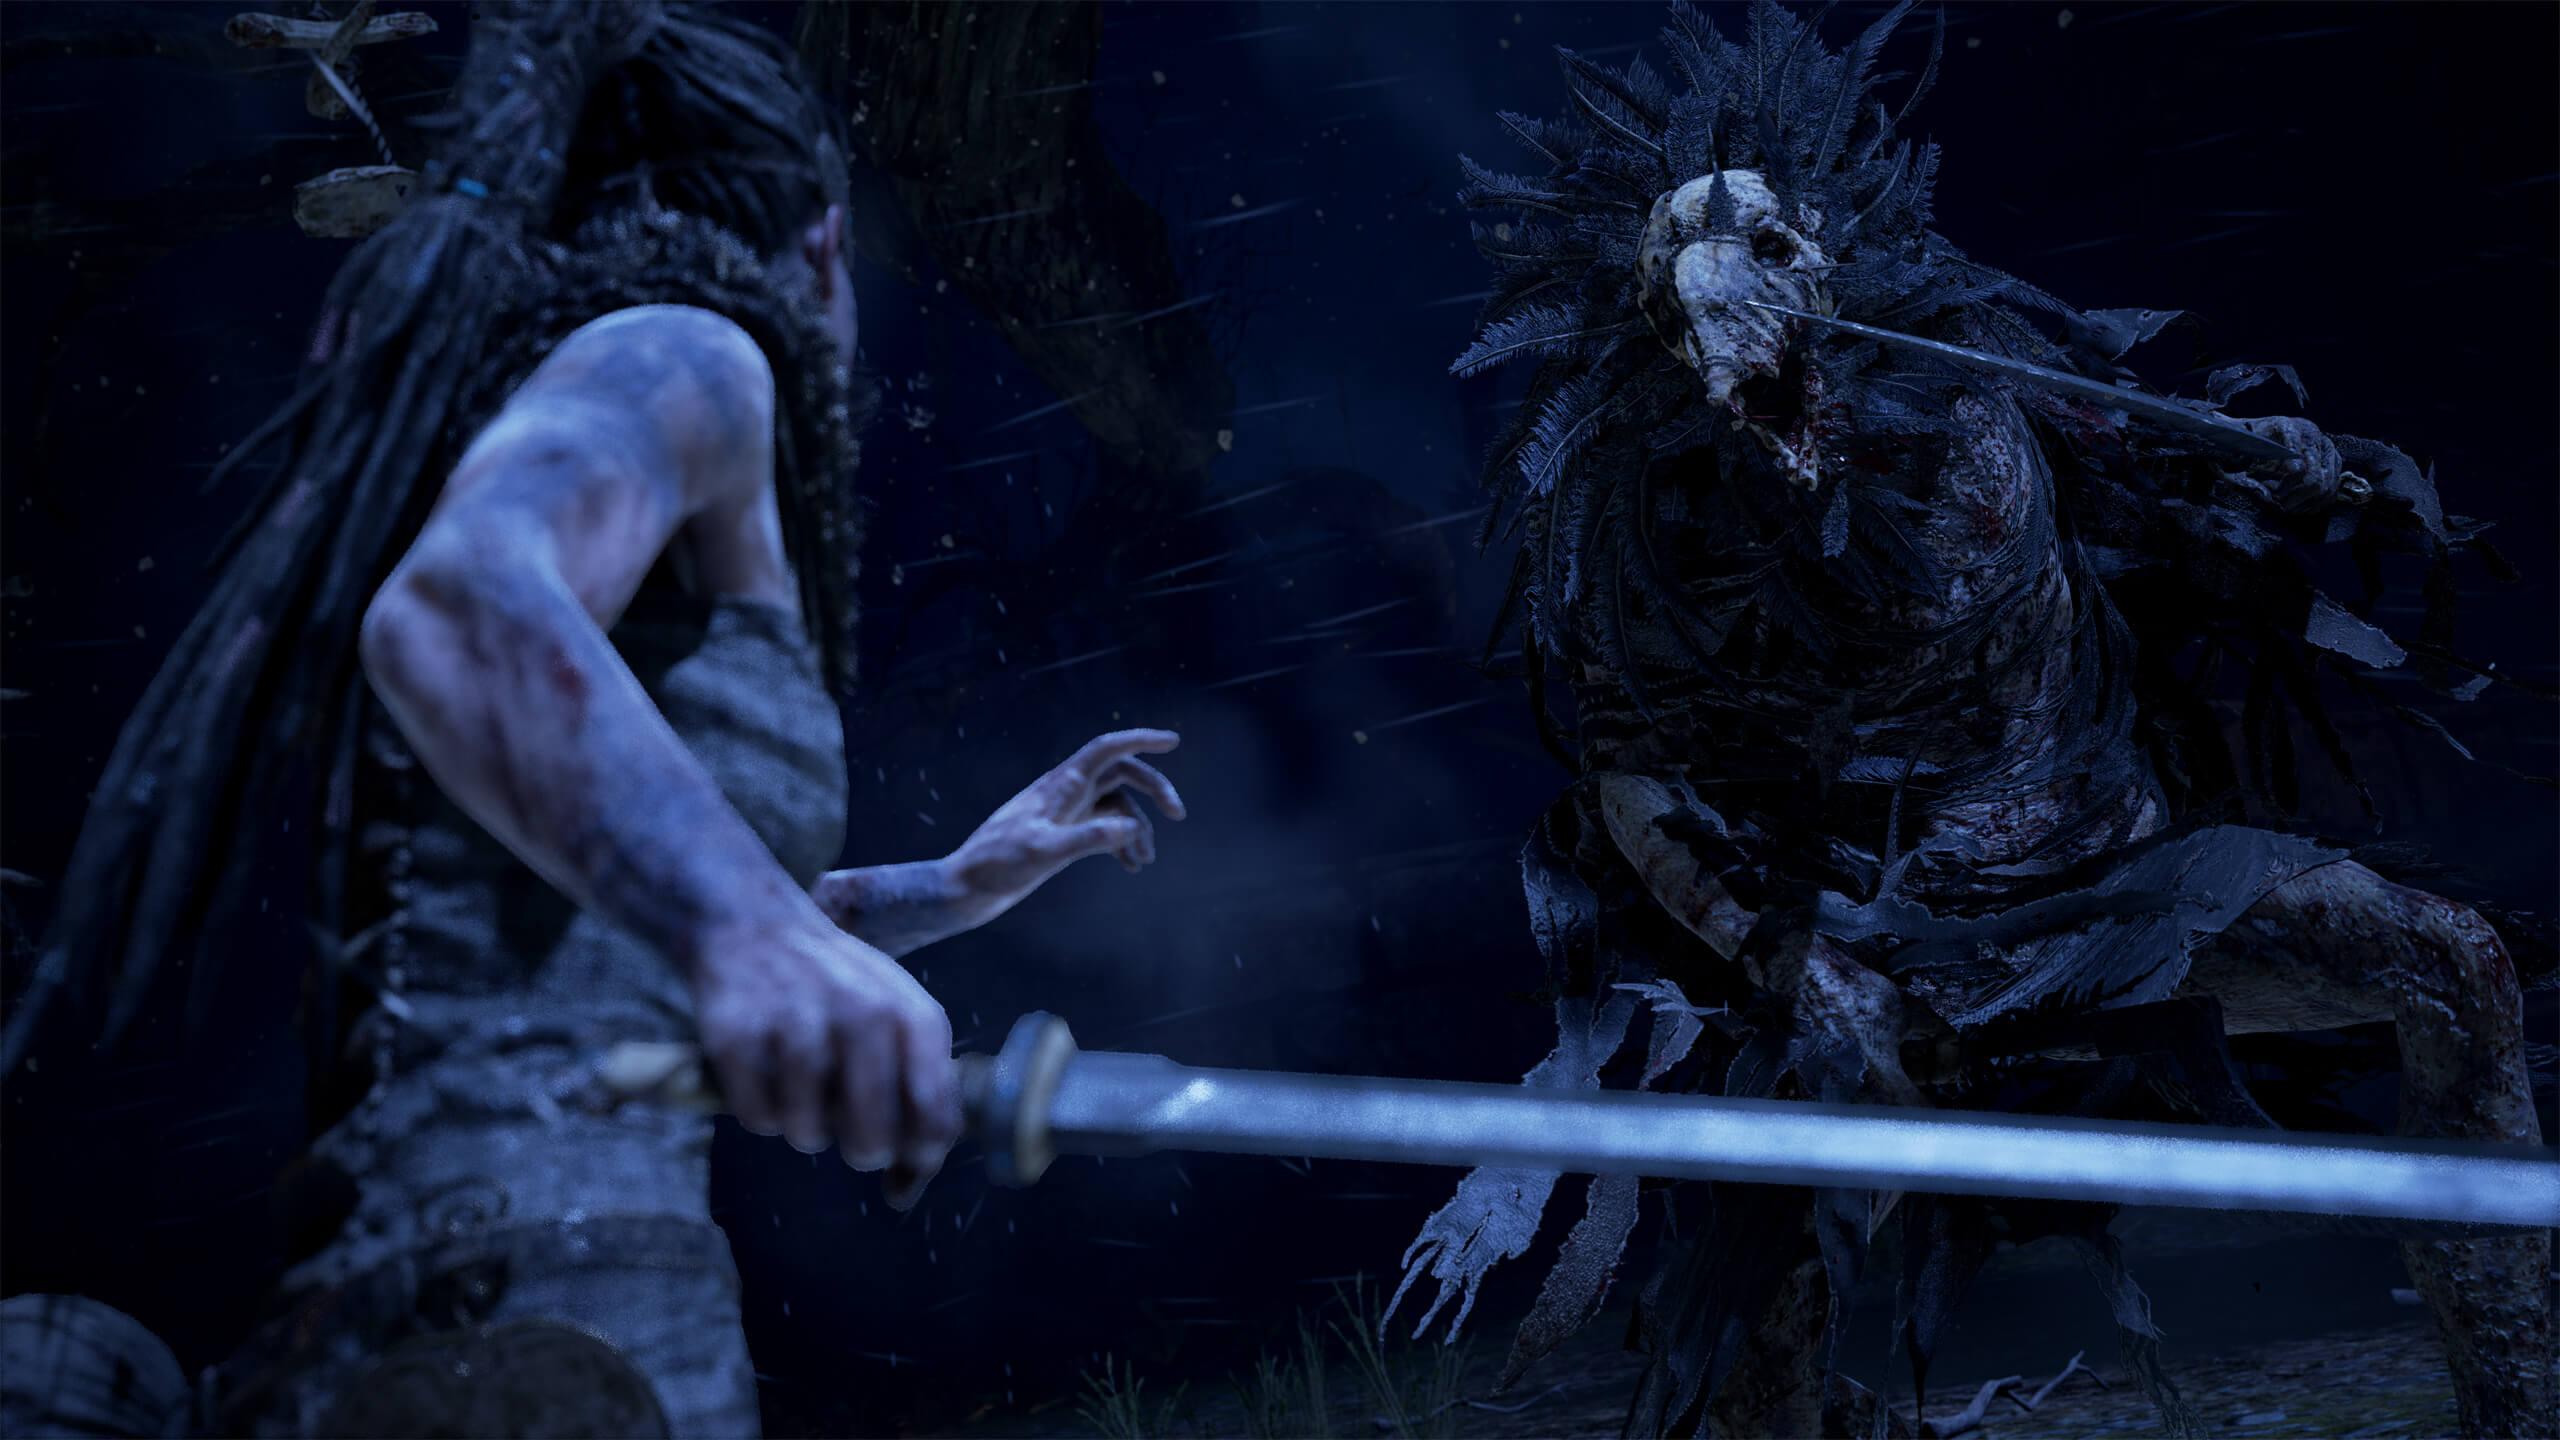 Hellblade's Senua oyun inceleme